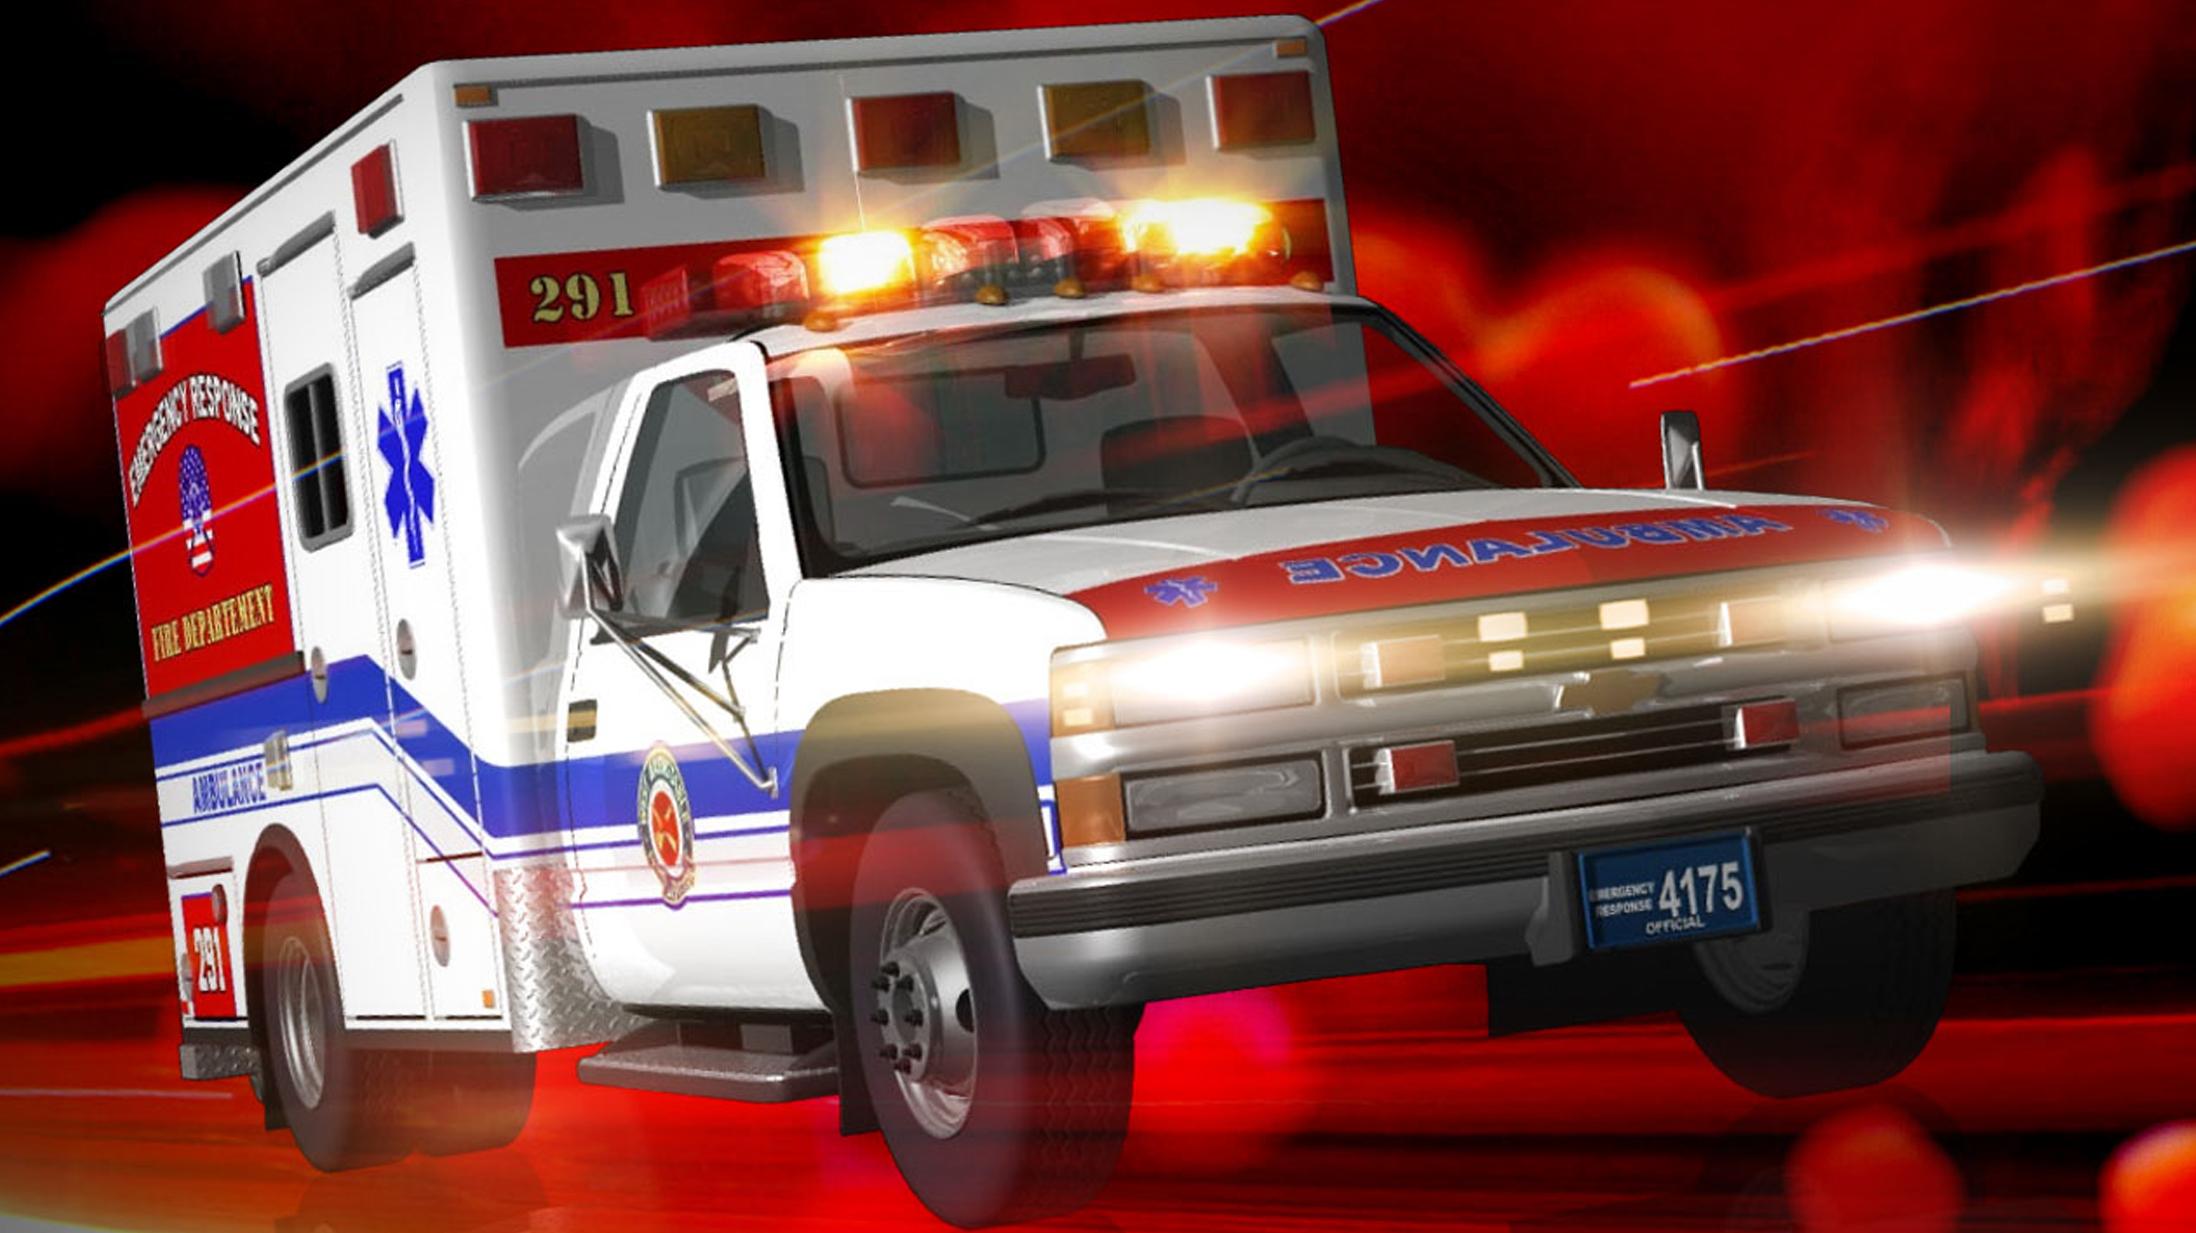 Ambulance_1446003905419.jpg